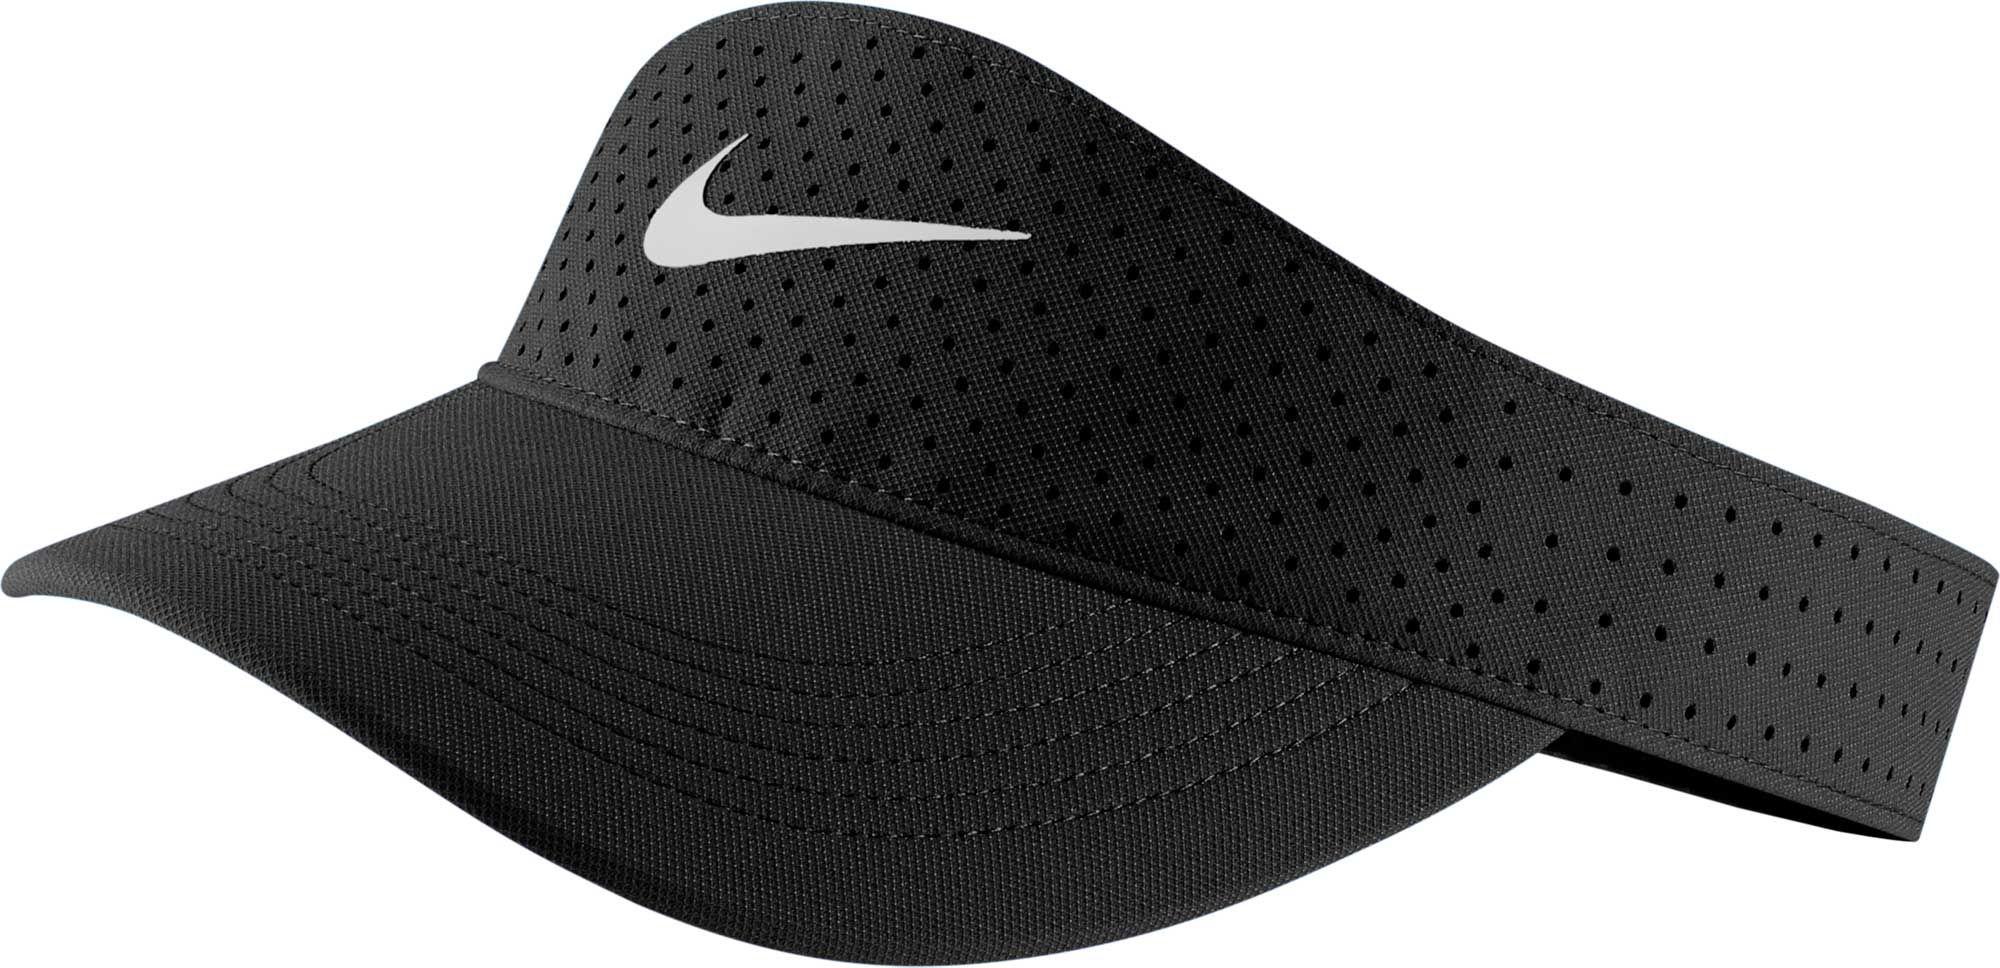 86eac0d5acf Lyst - Nike Dri-fit Aerobill Visor in Black for Men